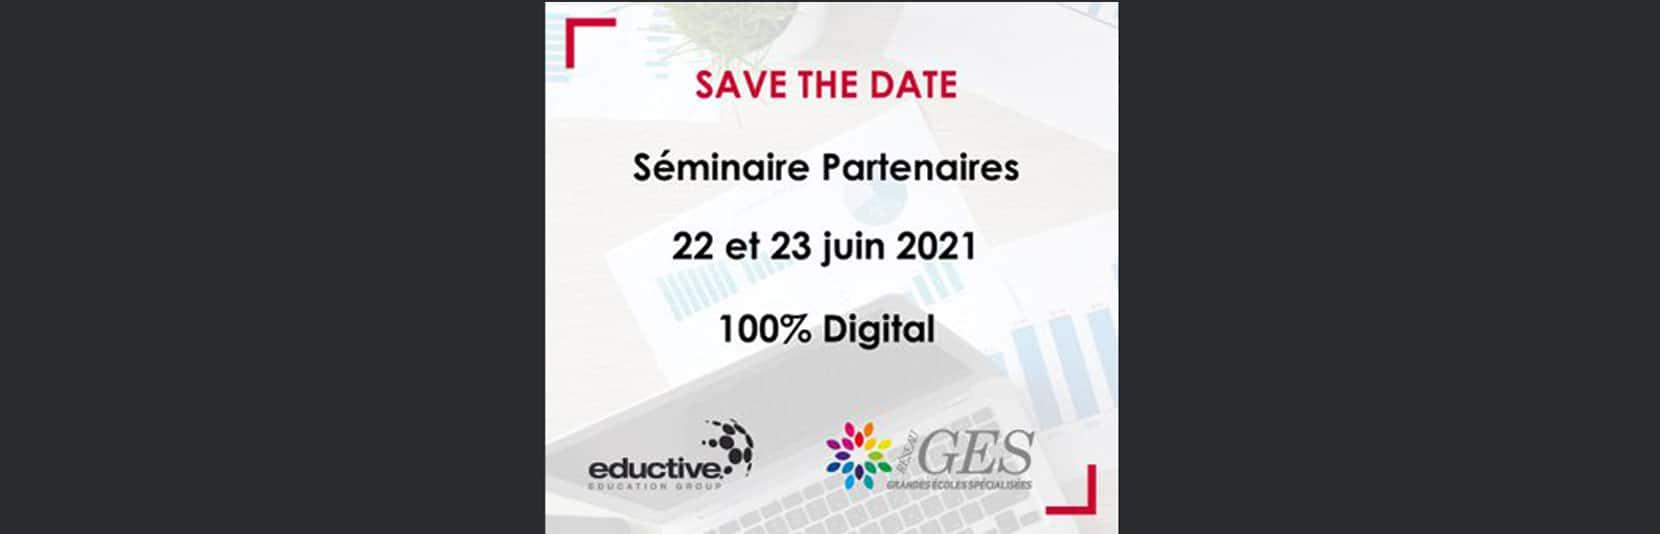 Save the date juin 2021